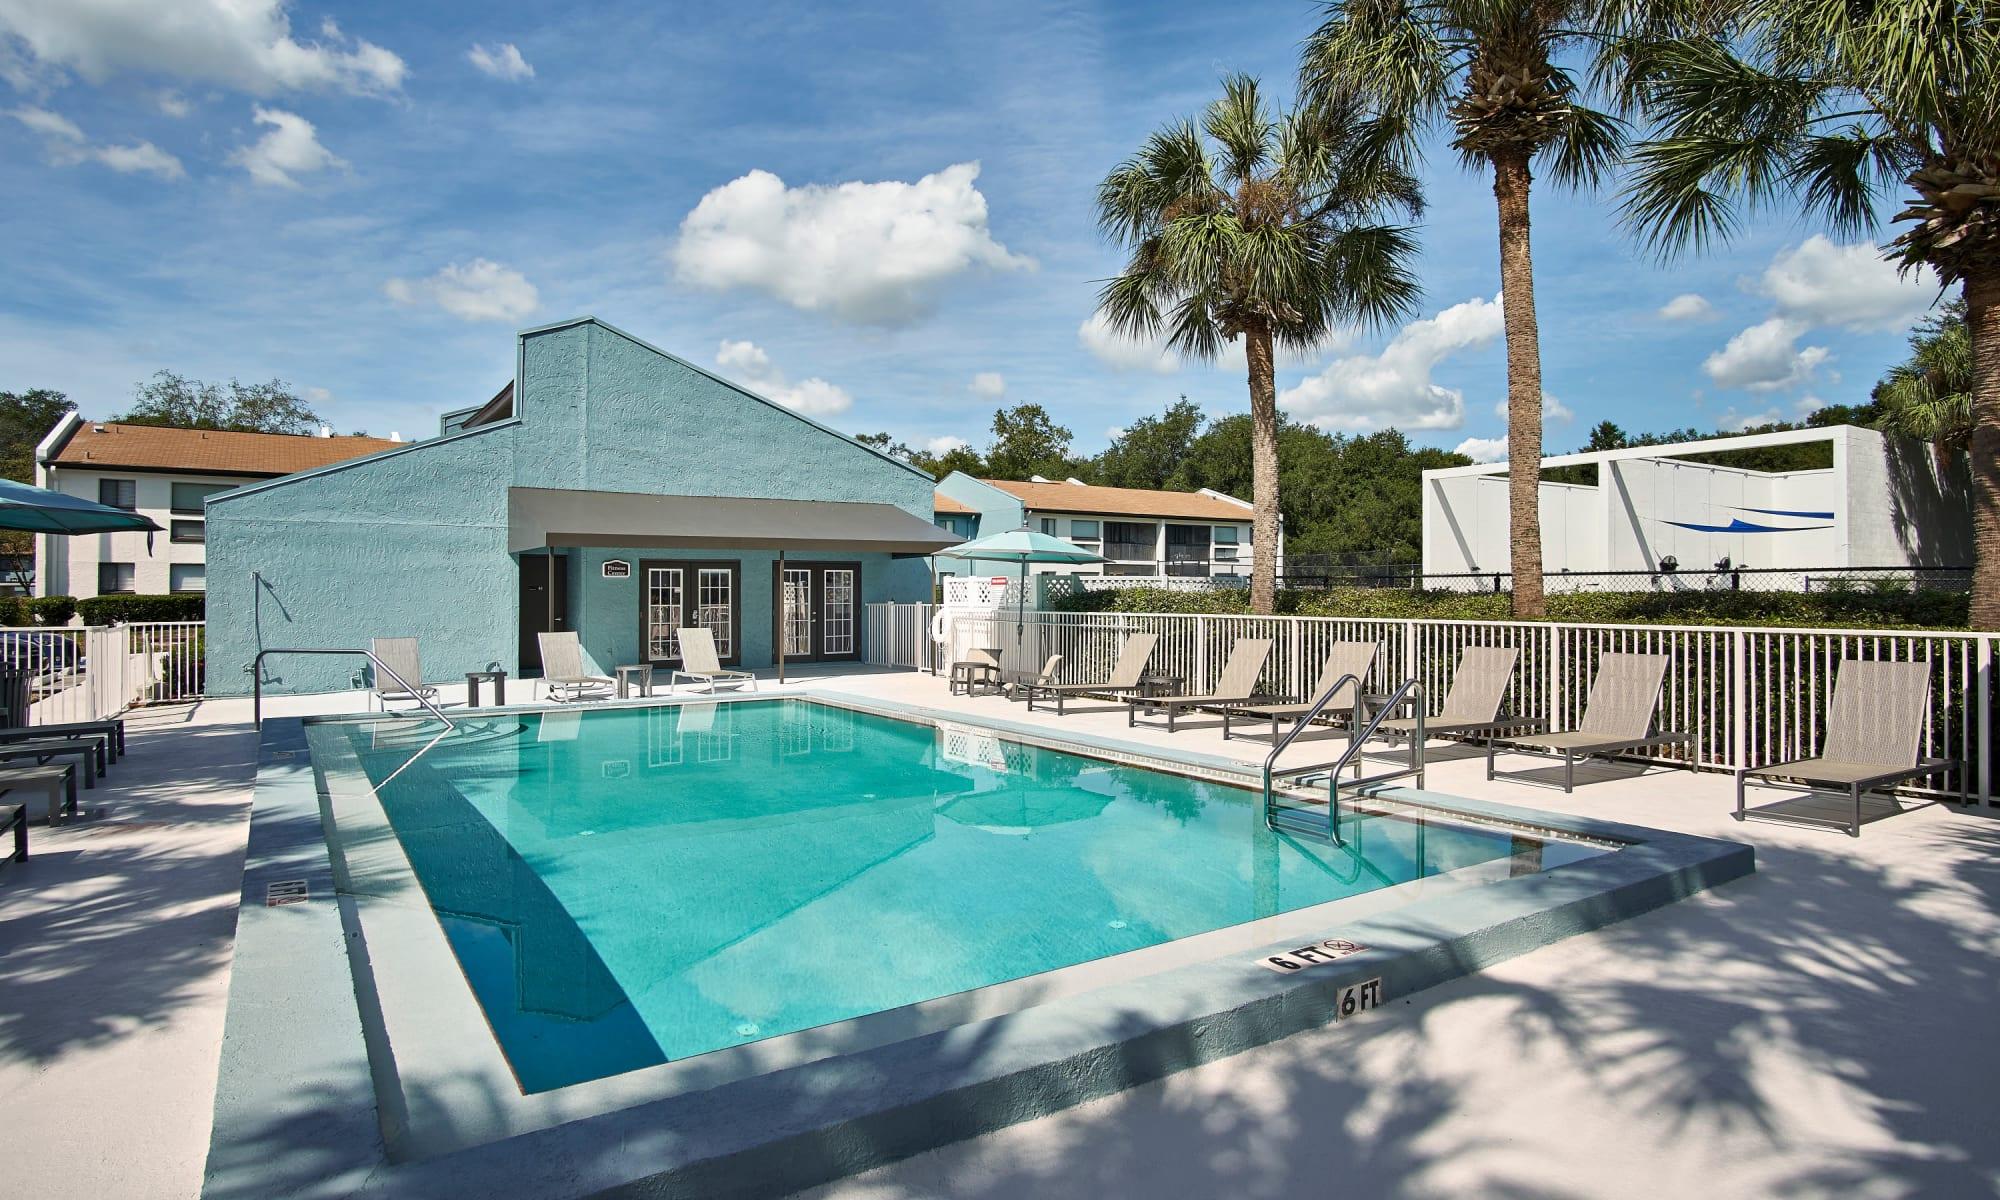 Apartments at Westwood @60 in Brandon, Florida